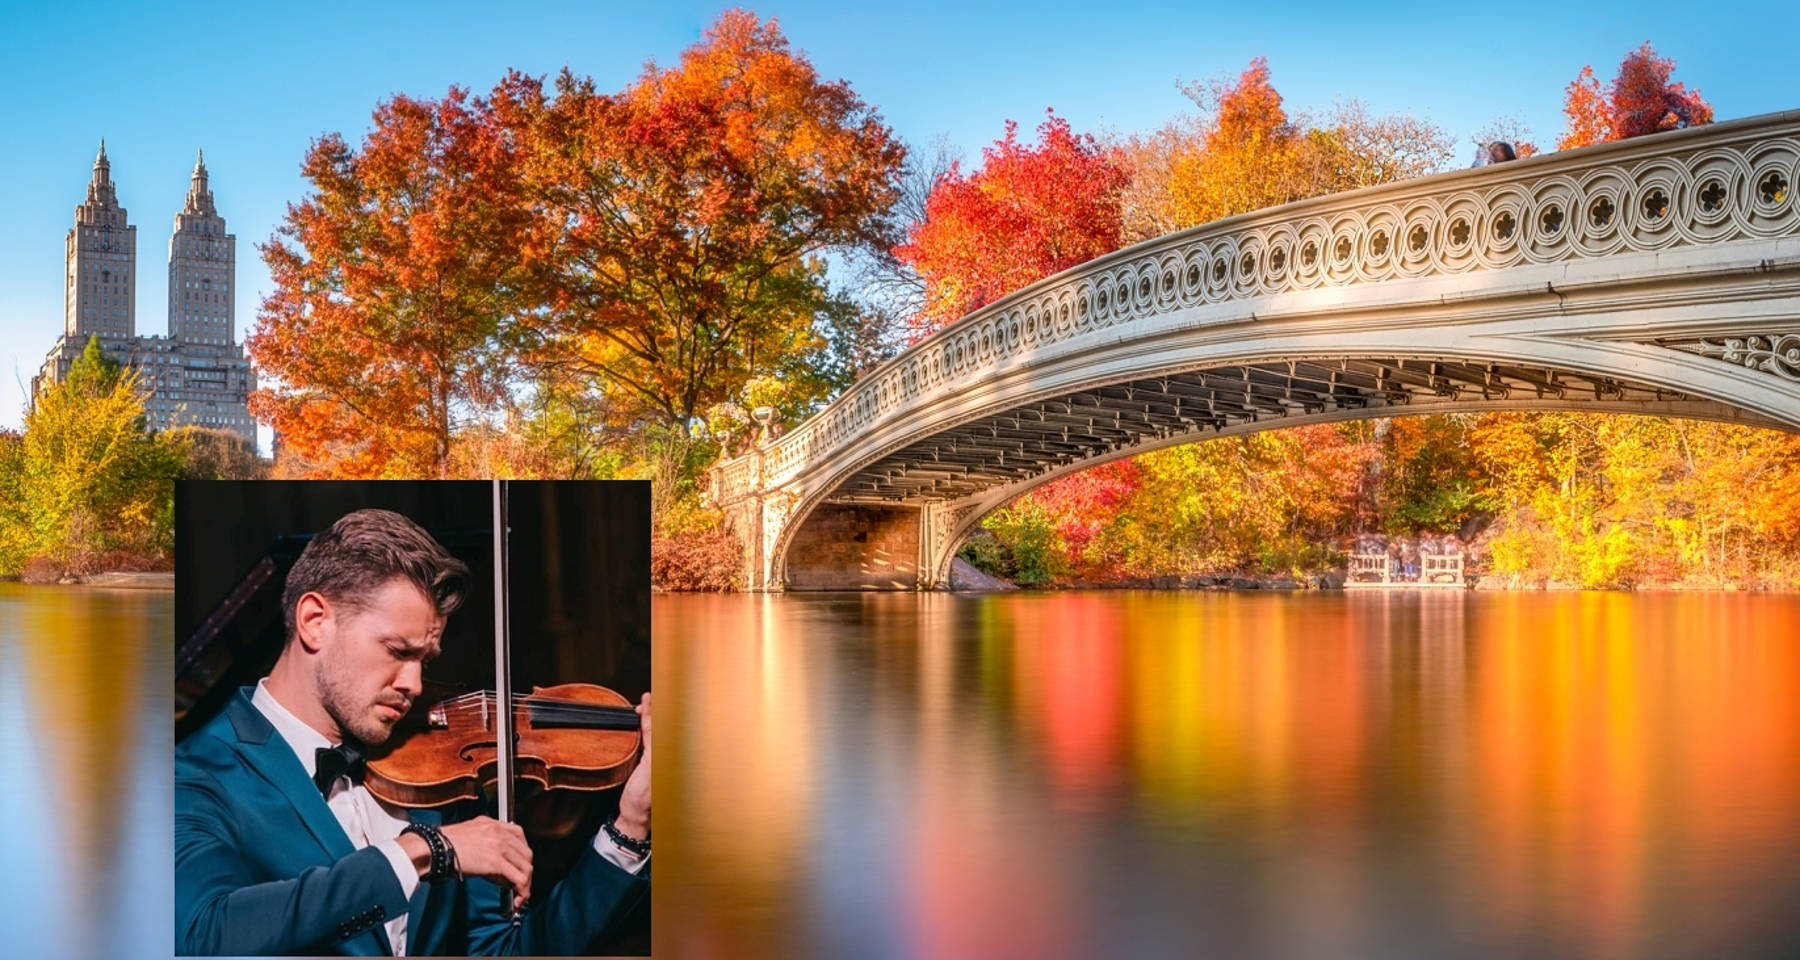 Foliage & Vivaldi's The Four Seasons: Fall @ Central Park